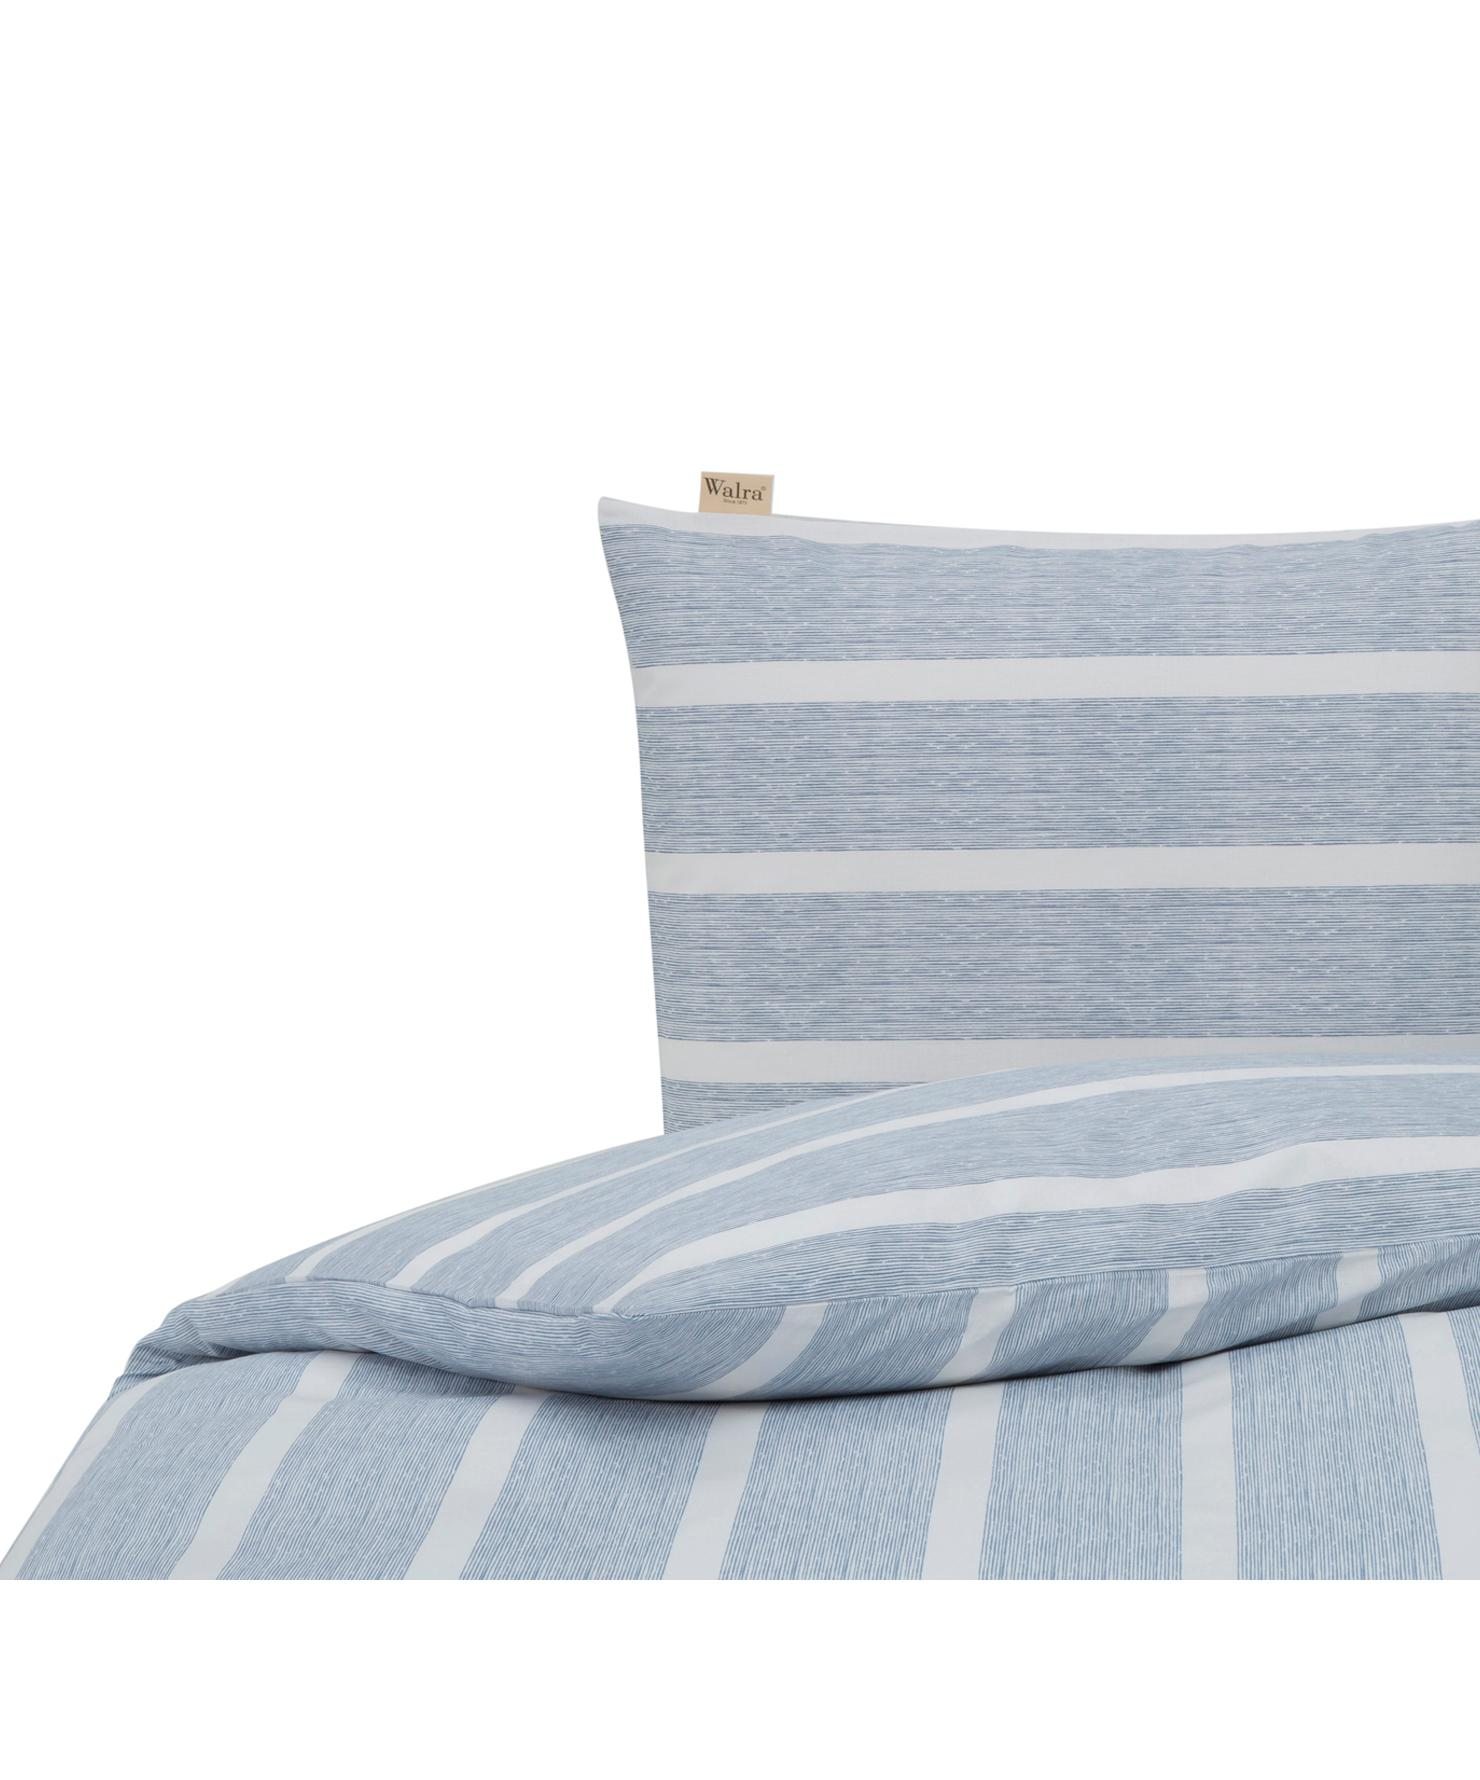 Dekbedovertrek Stripe Along, Katoen, Blauw, wit, 140 x 220 cm